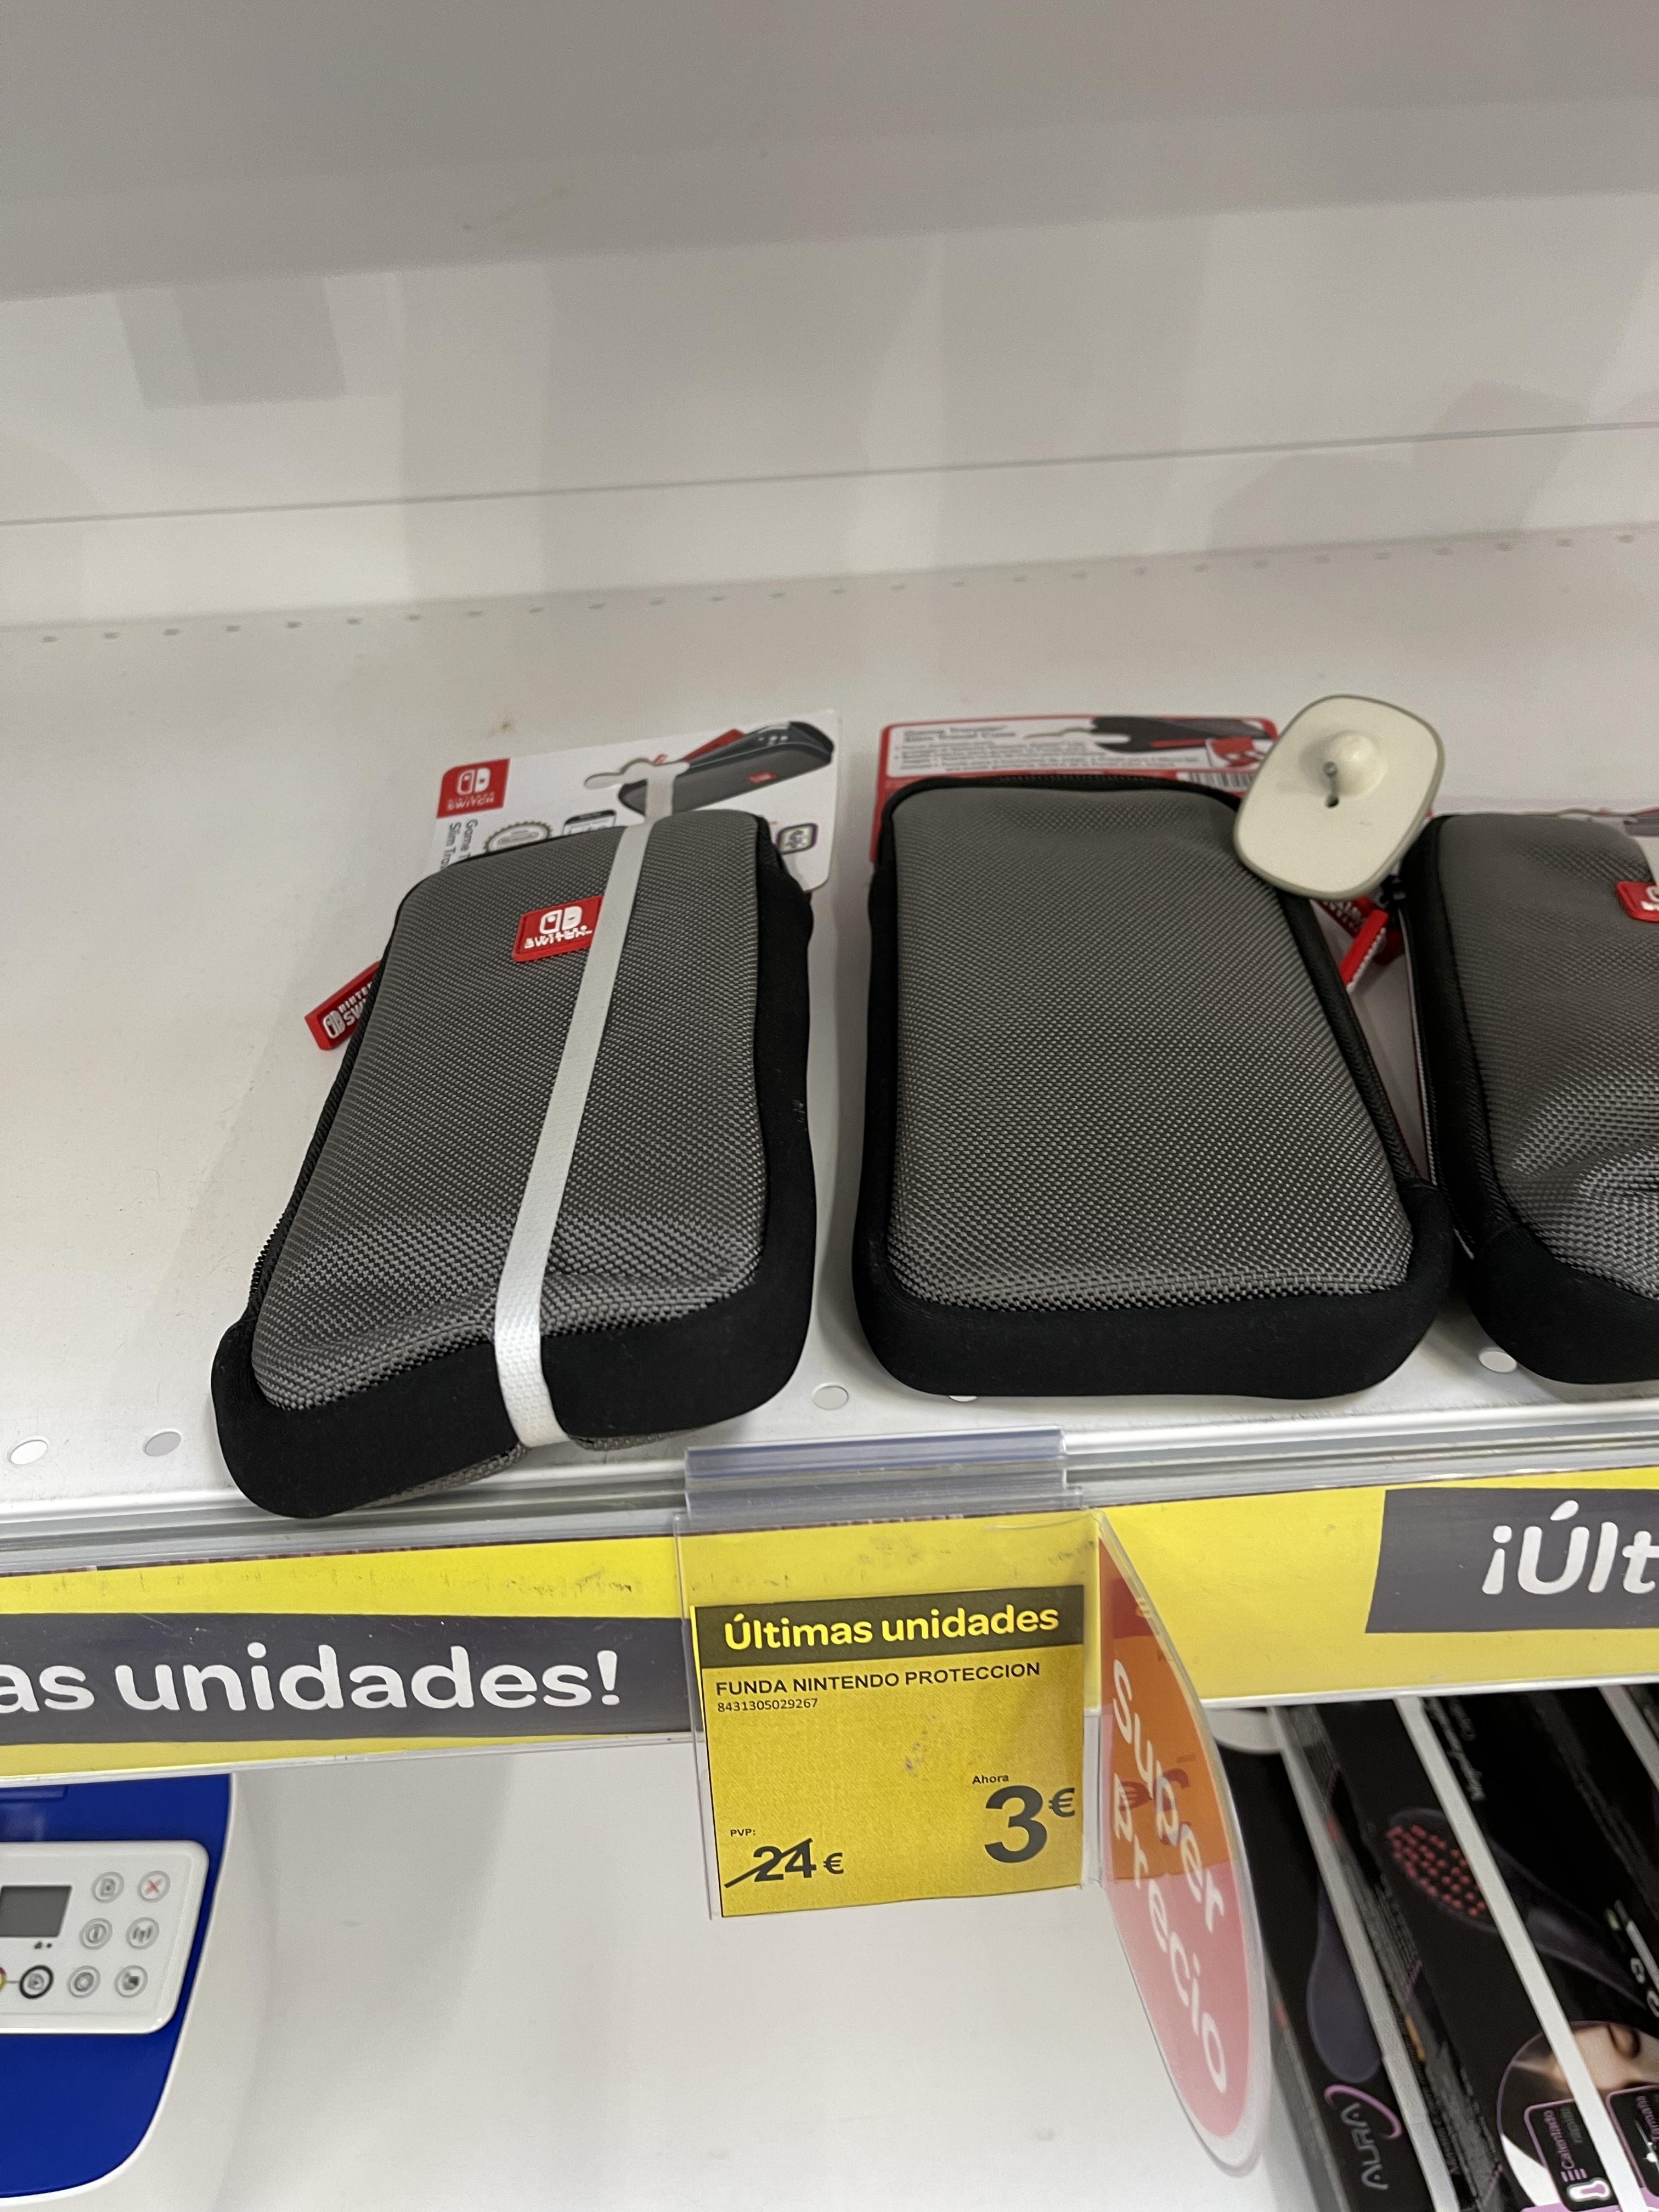 Funda nintendo switch lite (Carrefour Lorca, Murcia)